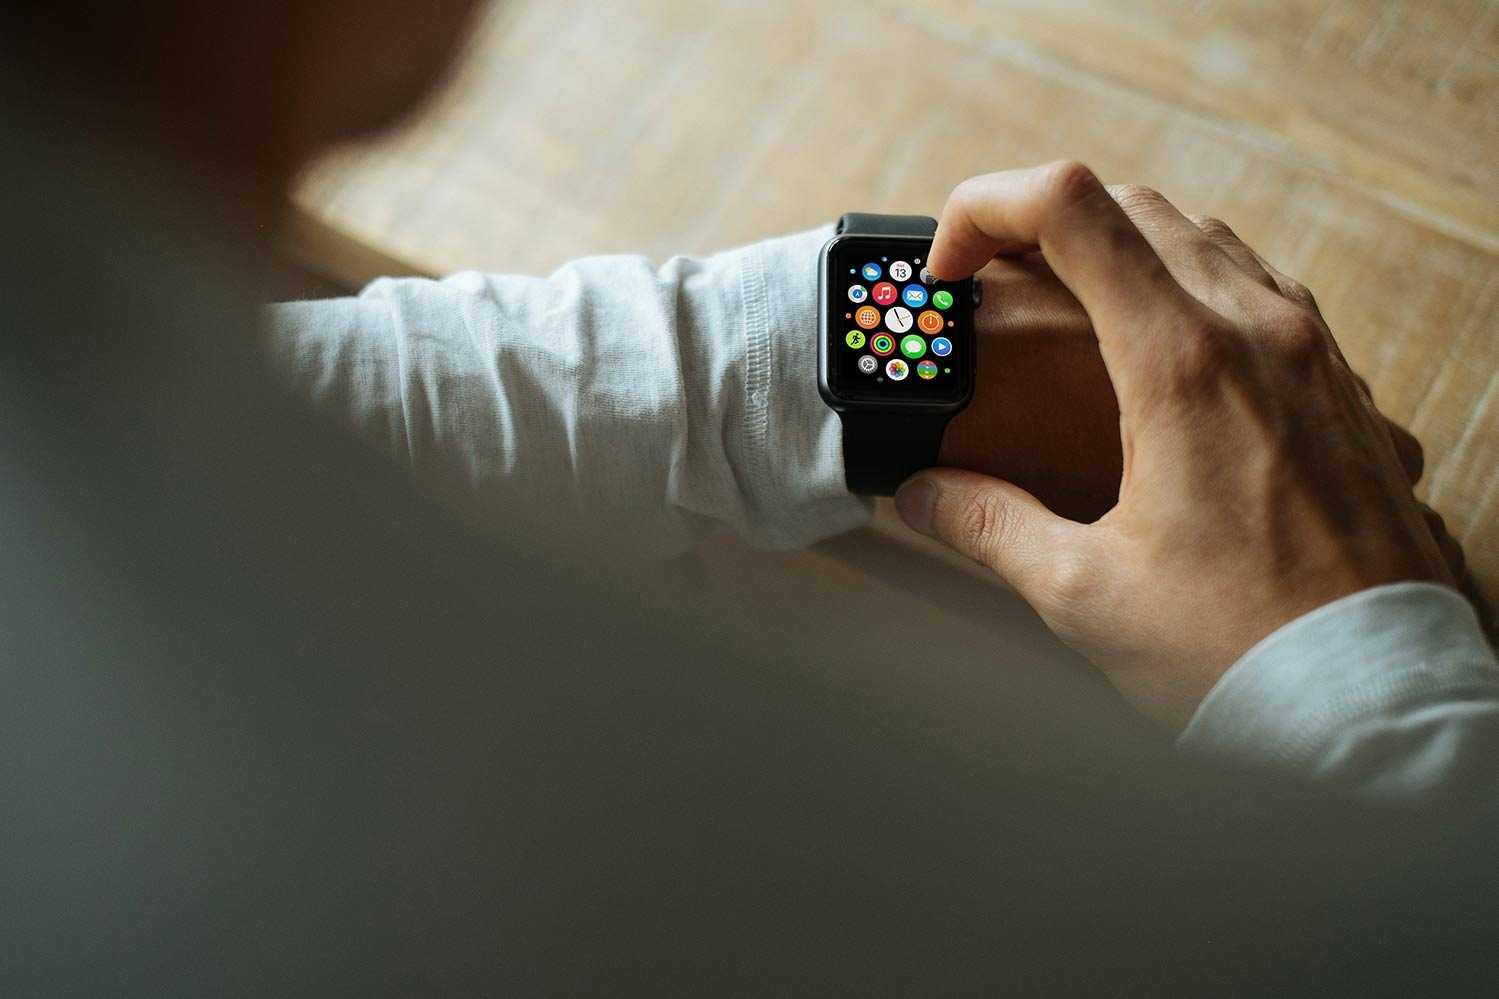 Notifications via Apple Watch